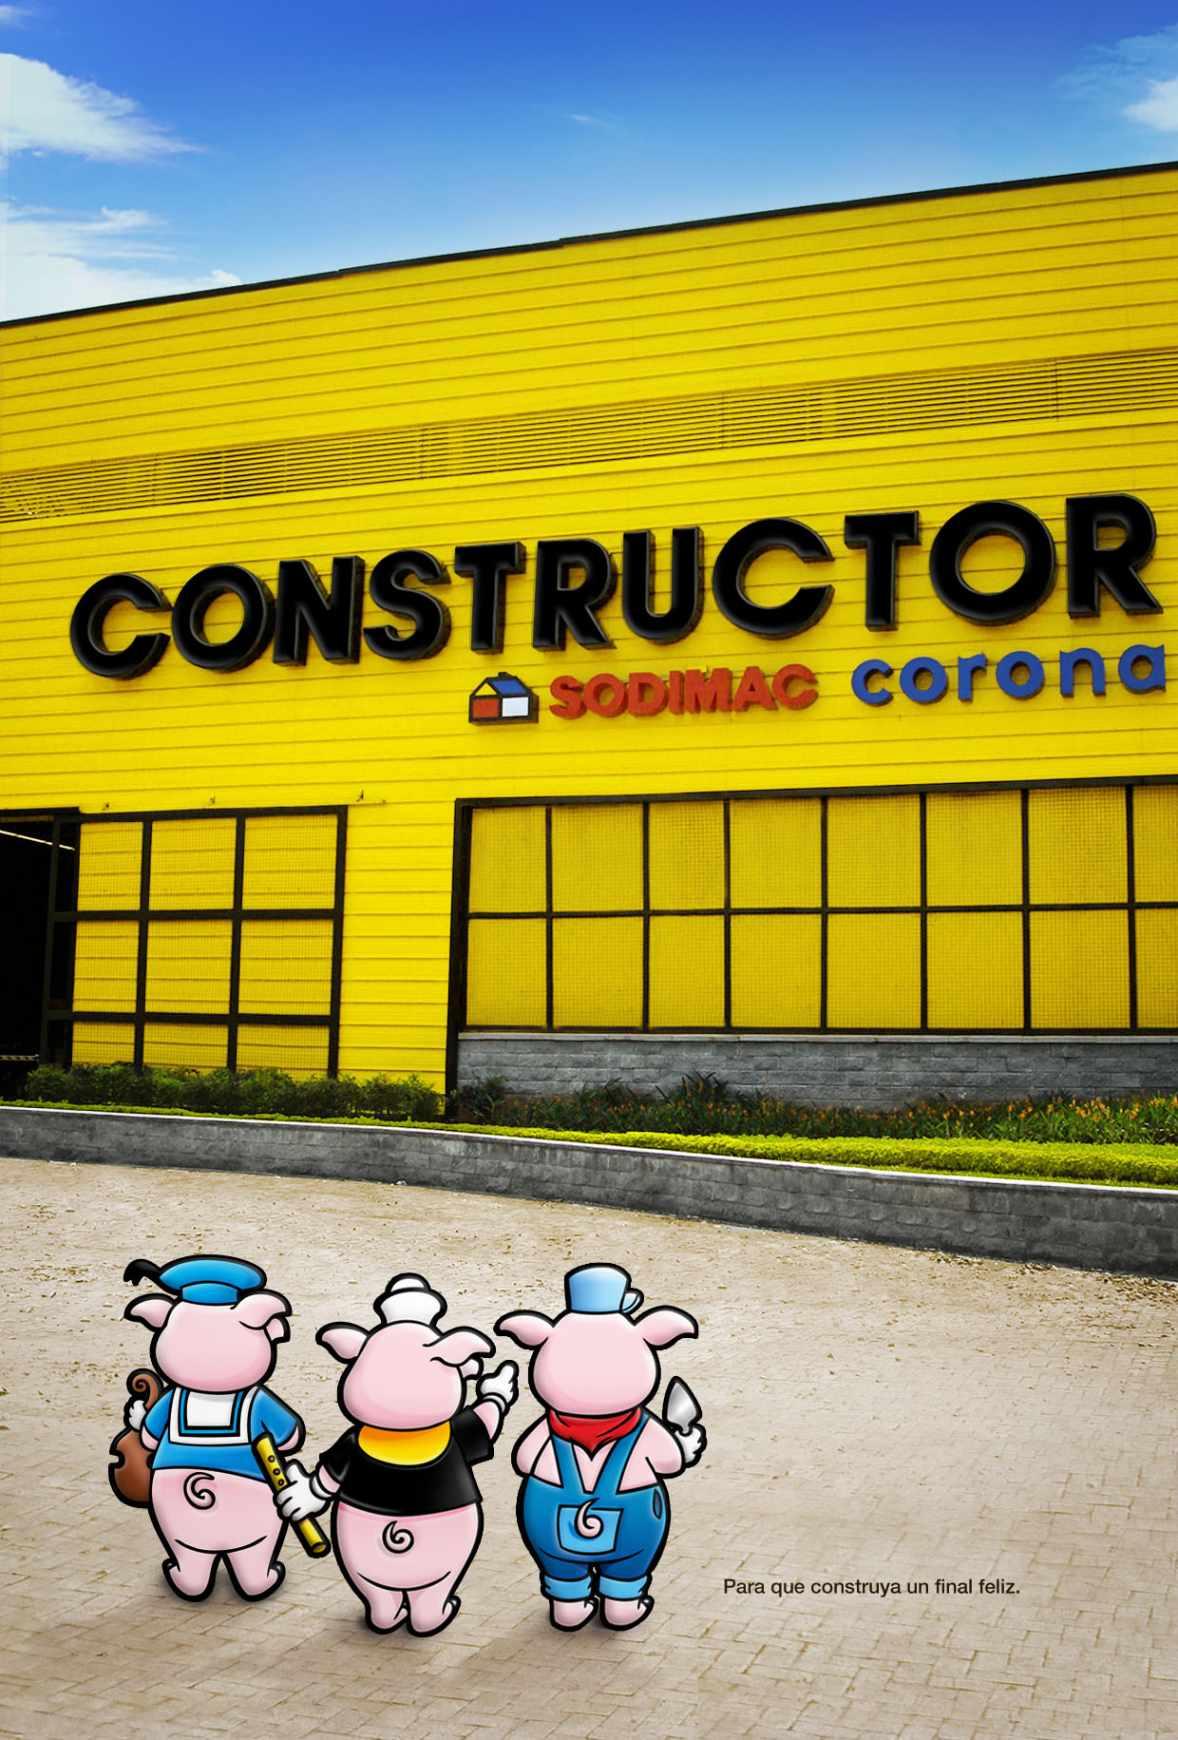 Constructor Sodimac Corona. Opiniones...